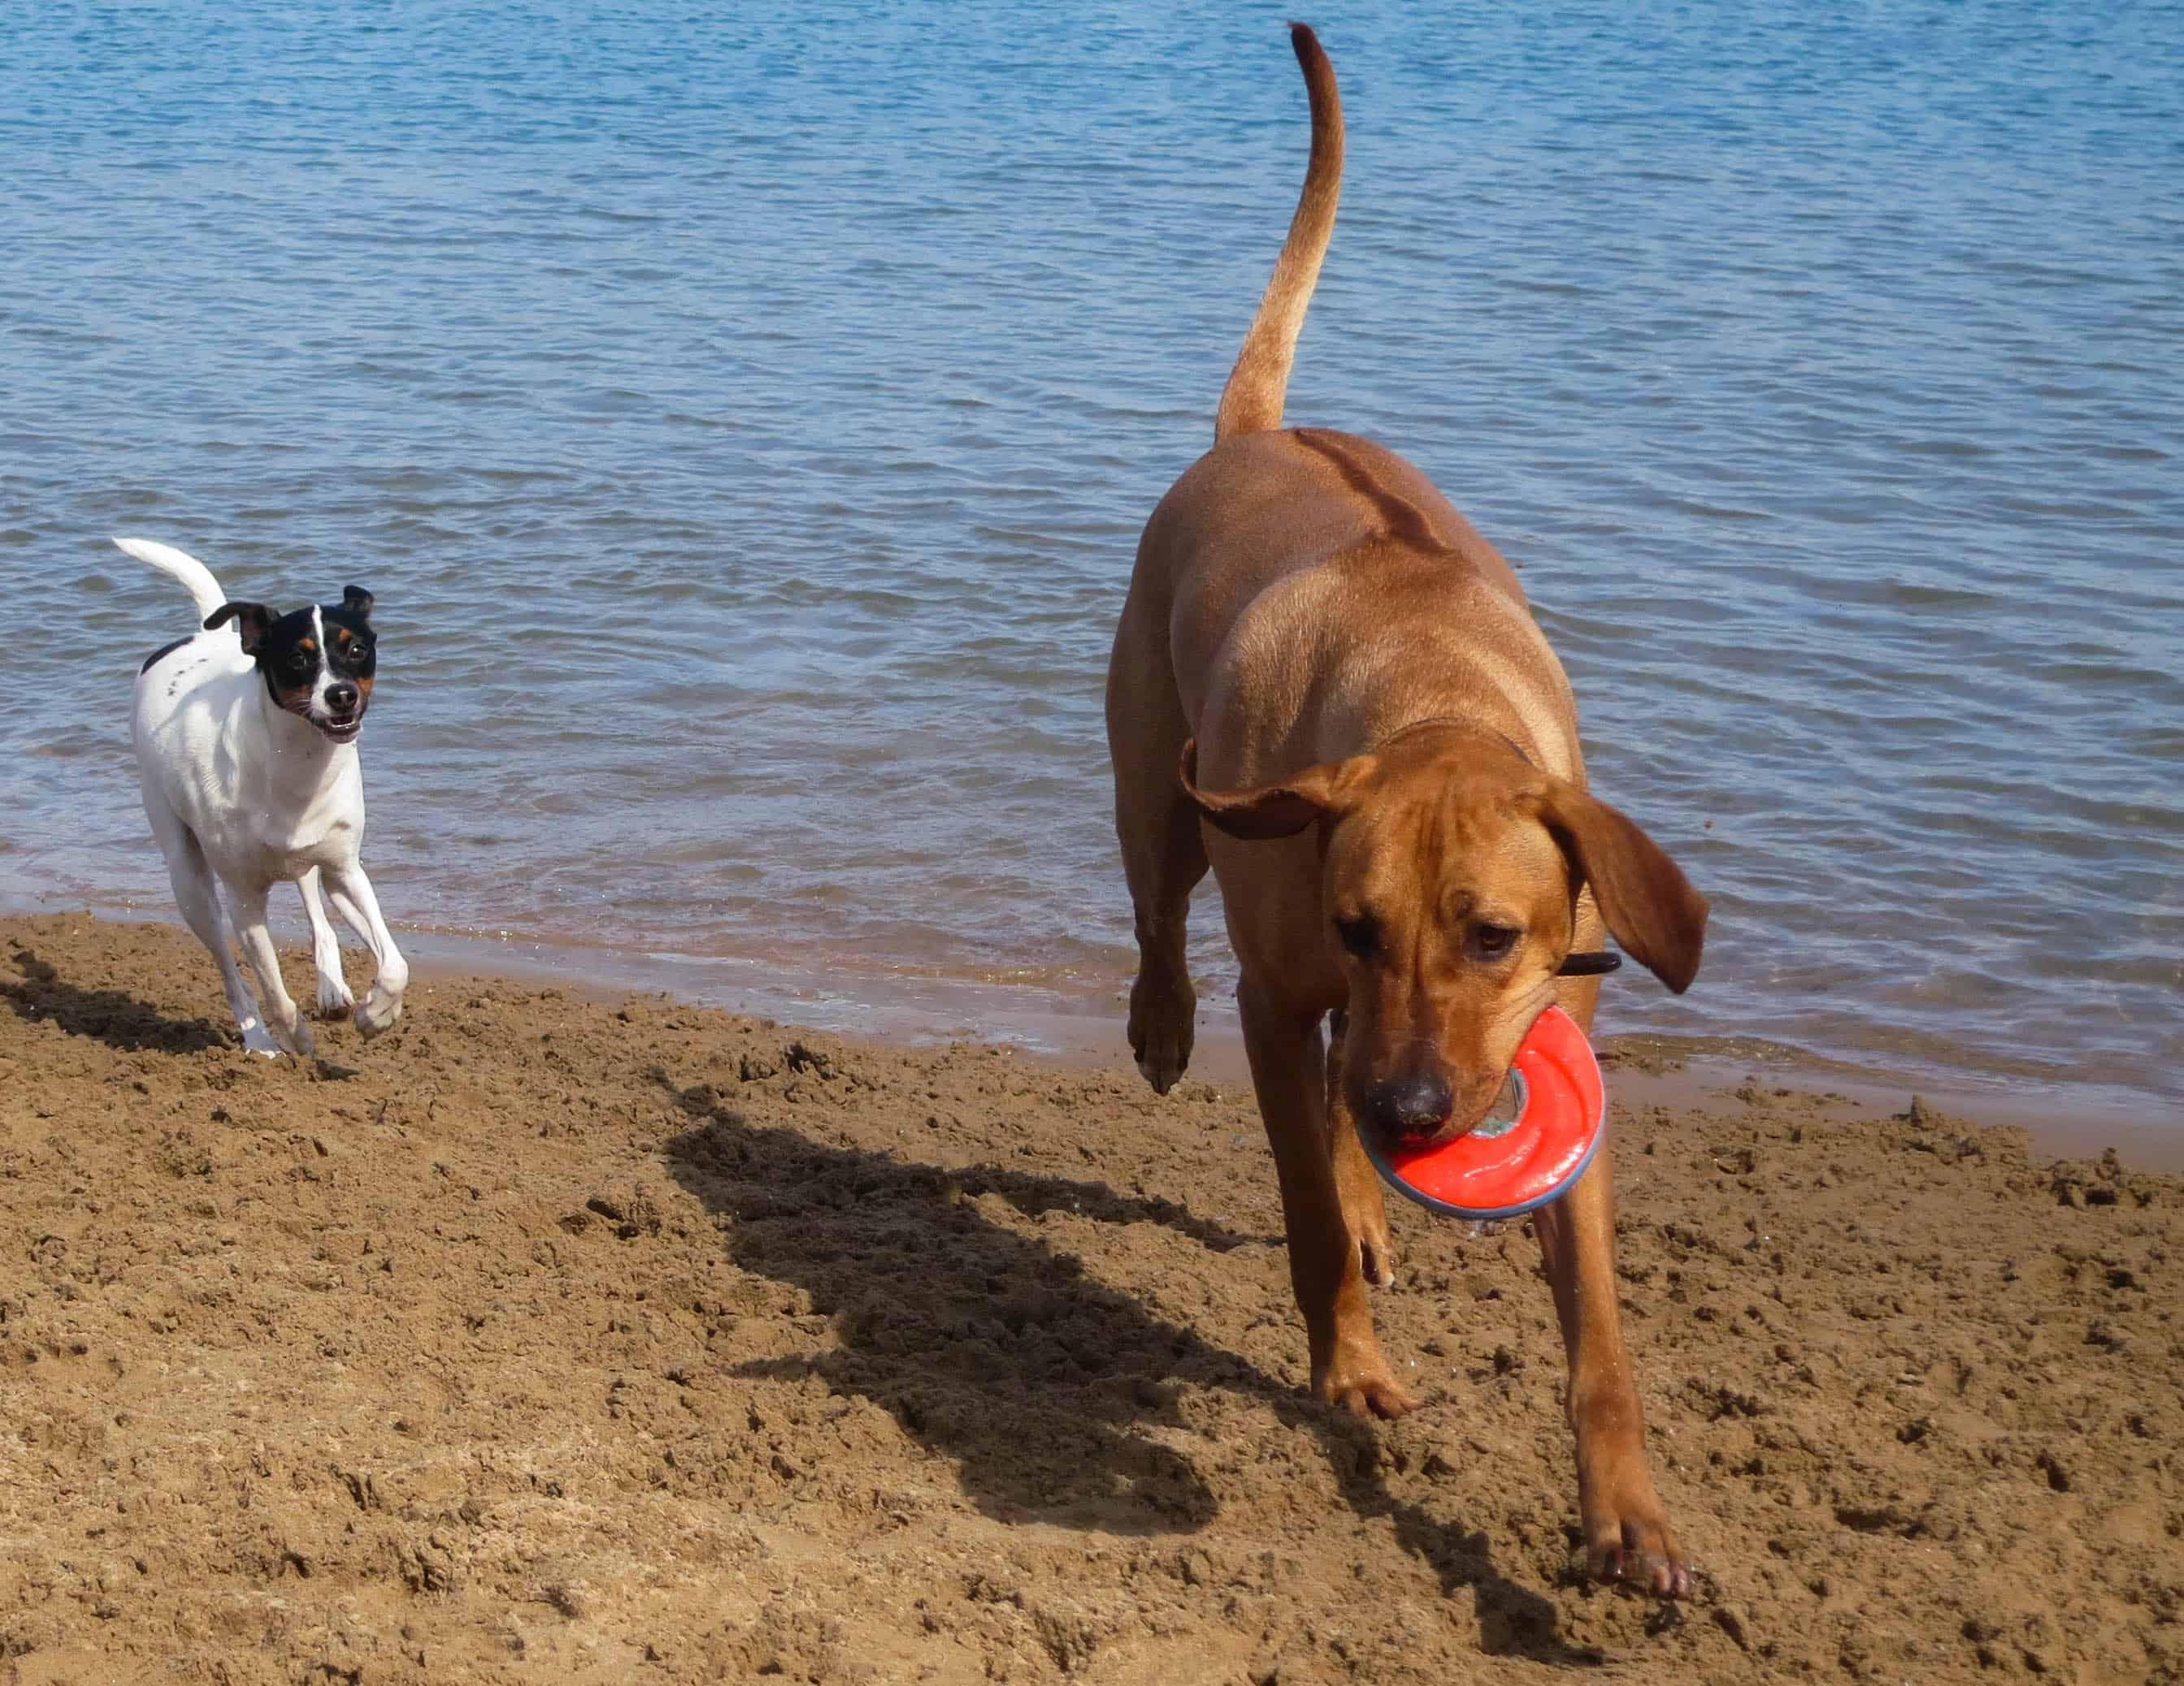 Rhodesian Ridgeback photo, pet adventure, dog blog, chicago, petcentric, dog beach